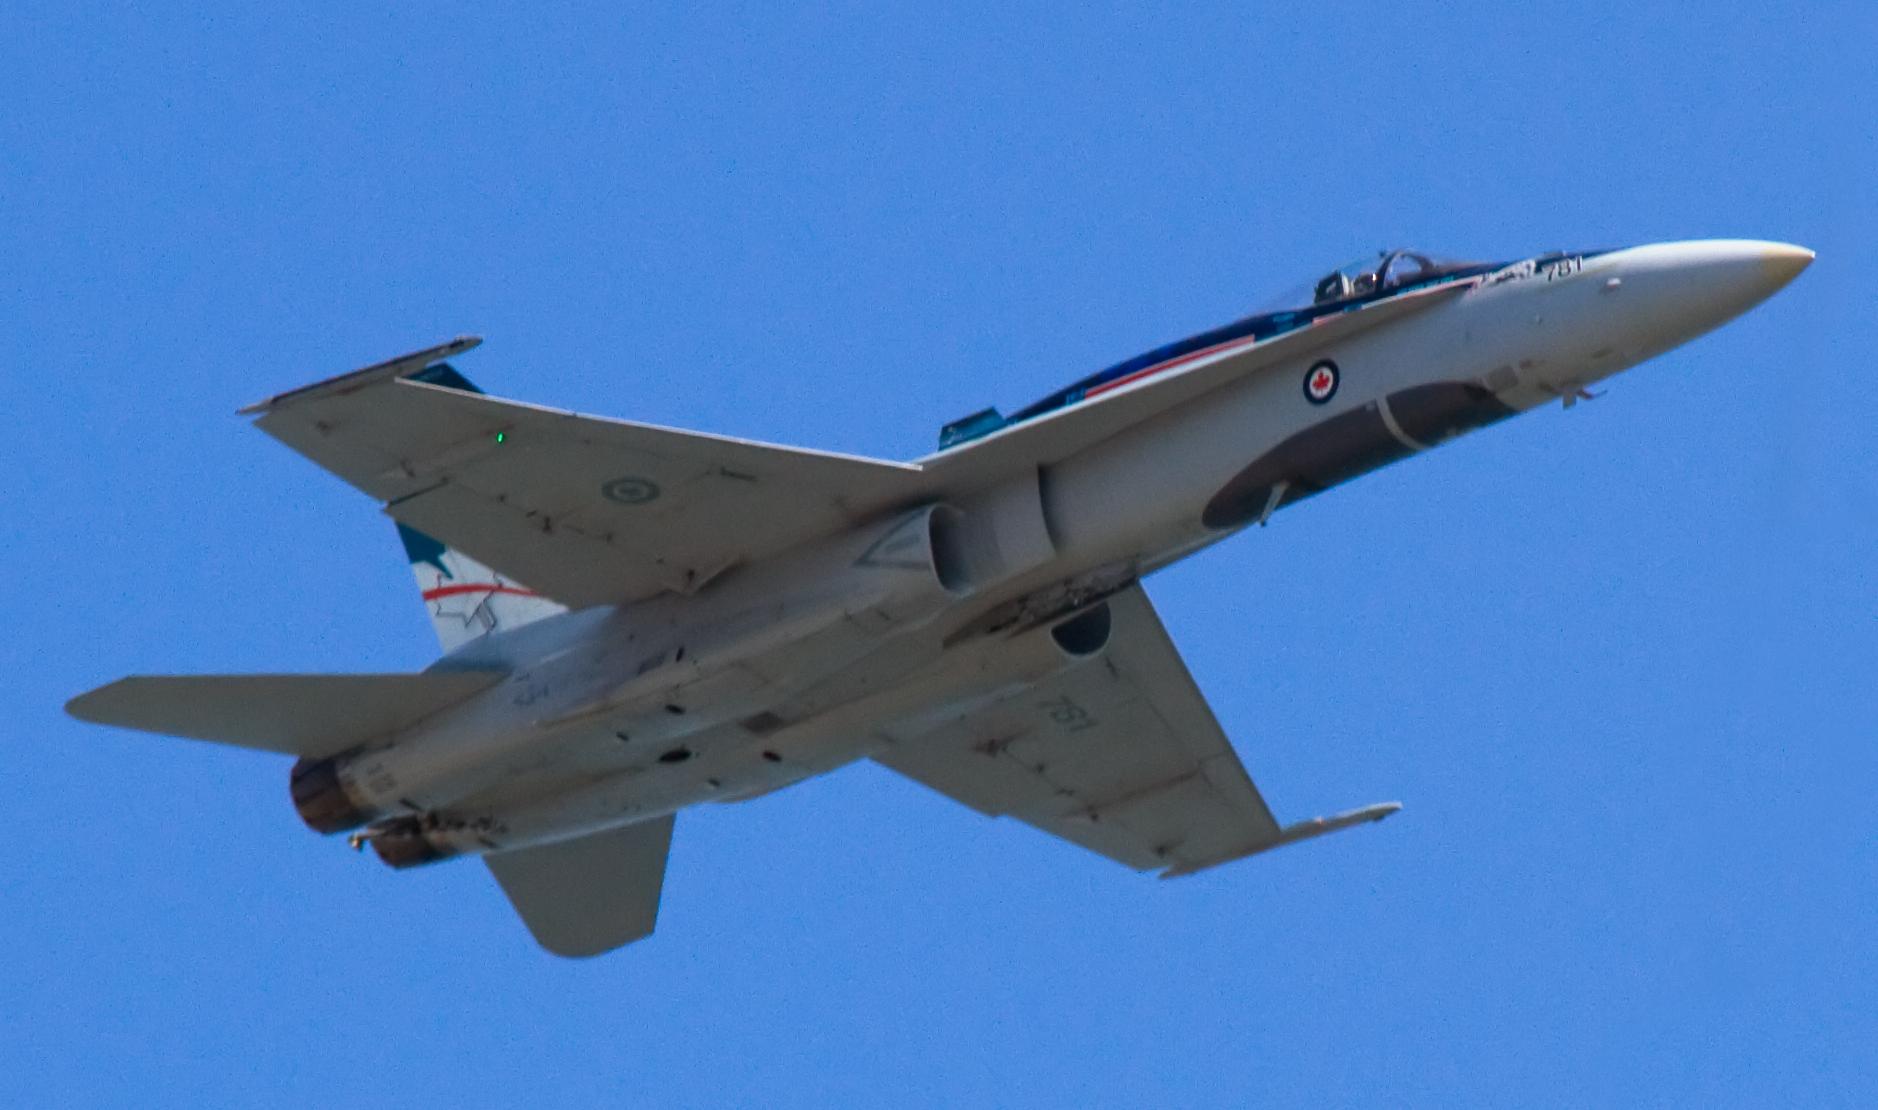 Canadian_McDonnell_Douglas_CF-18_Hornet_3_(7917628008)